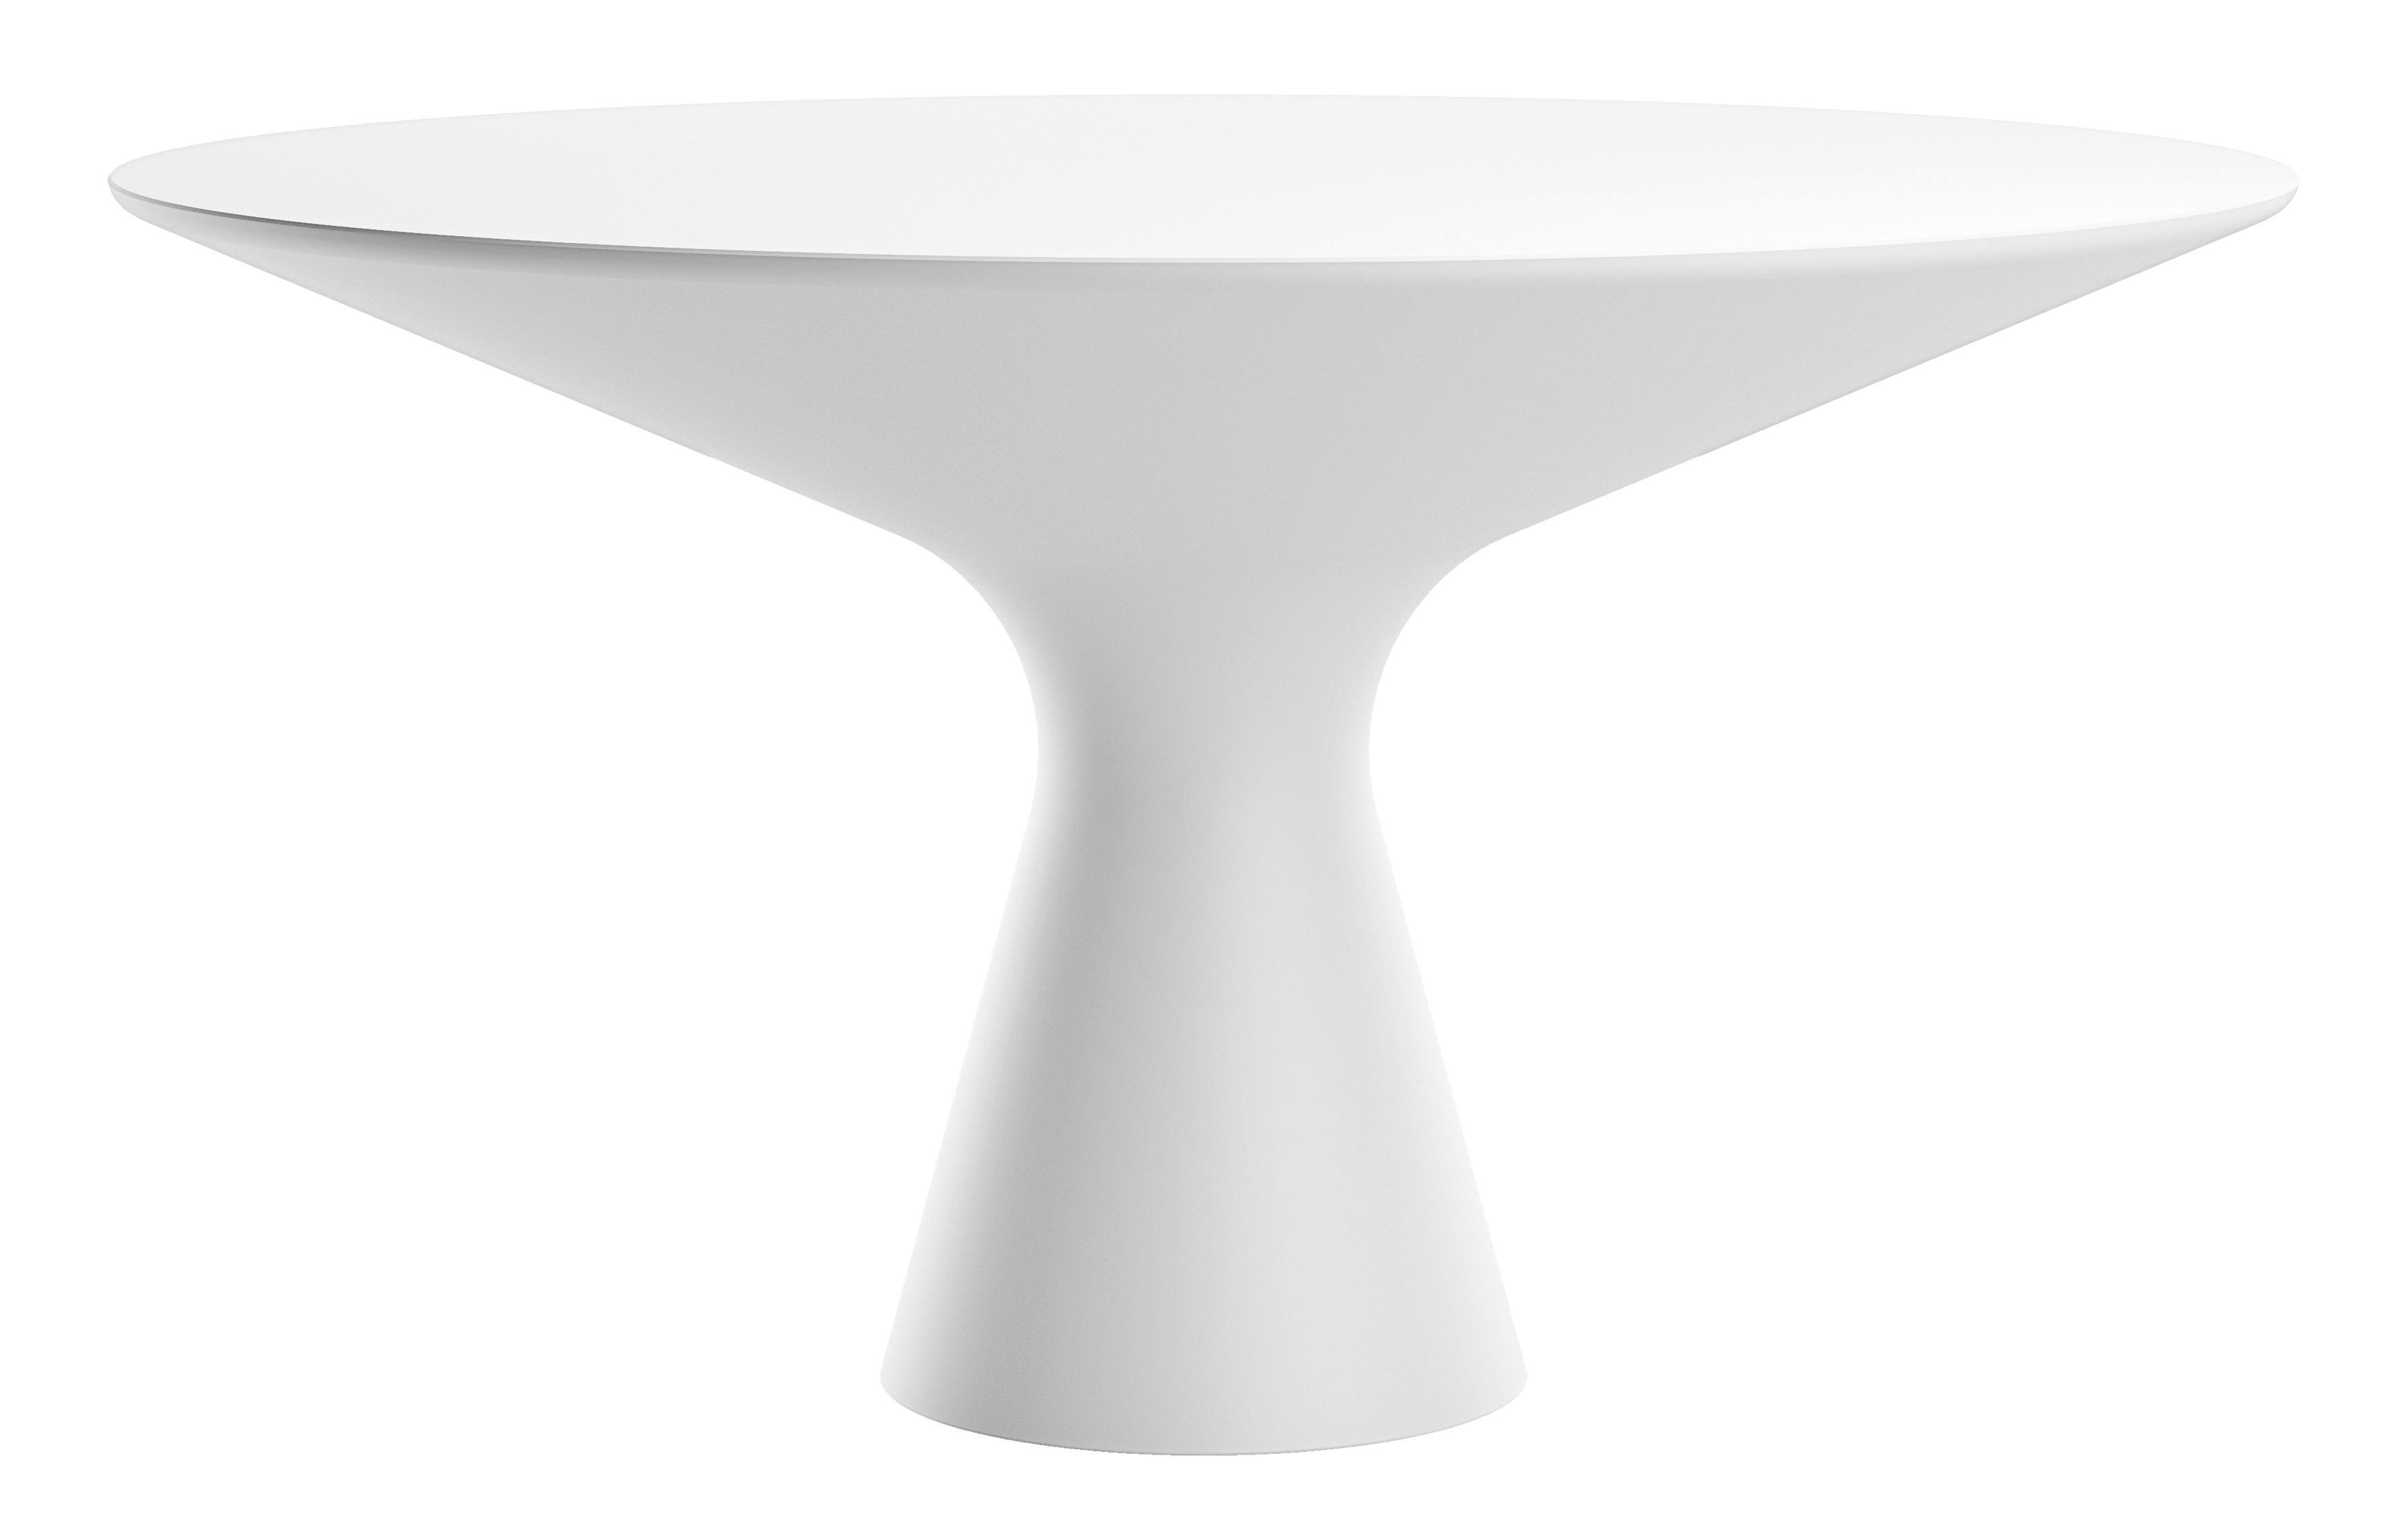 Mobilier - Tables - Table ronde Blanco / Ø 130 cm - Zanotta - Blanc - Cristalplant